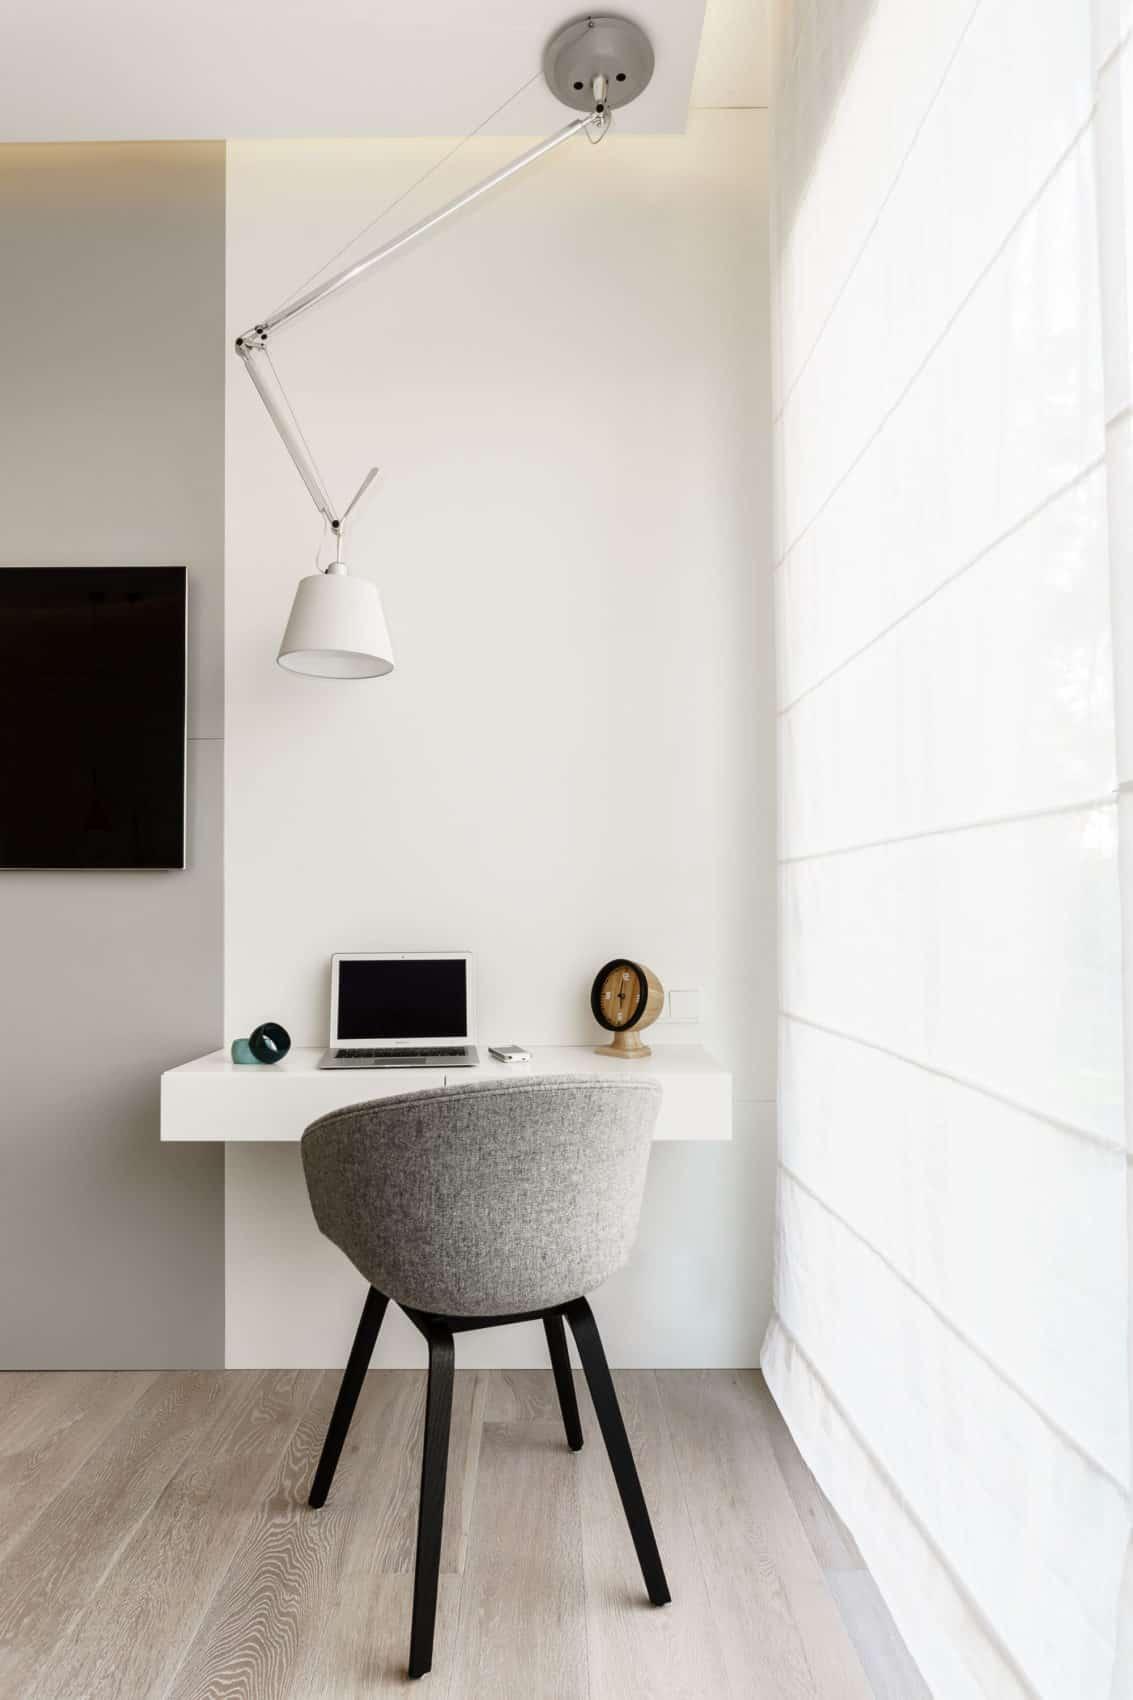 Minimalist Apartment in Gdynia by Dsgn Studio Dragon Art (11)